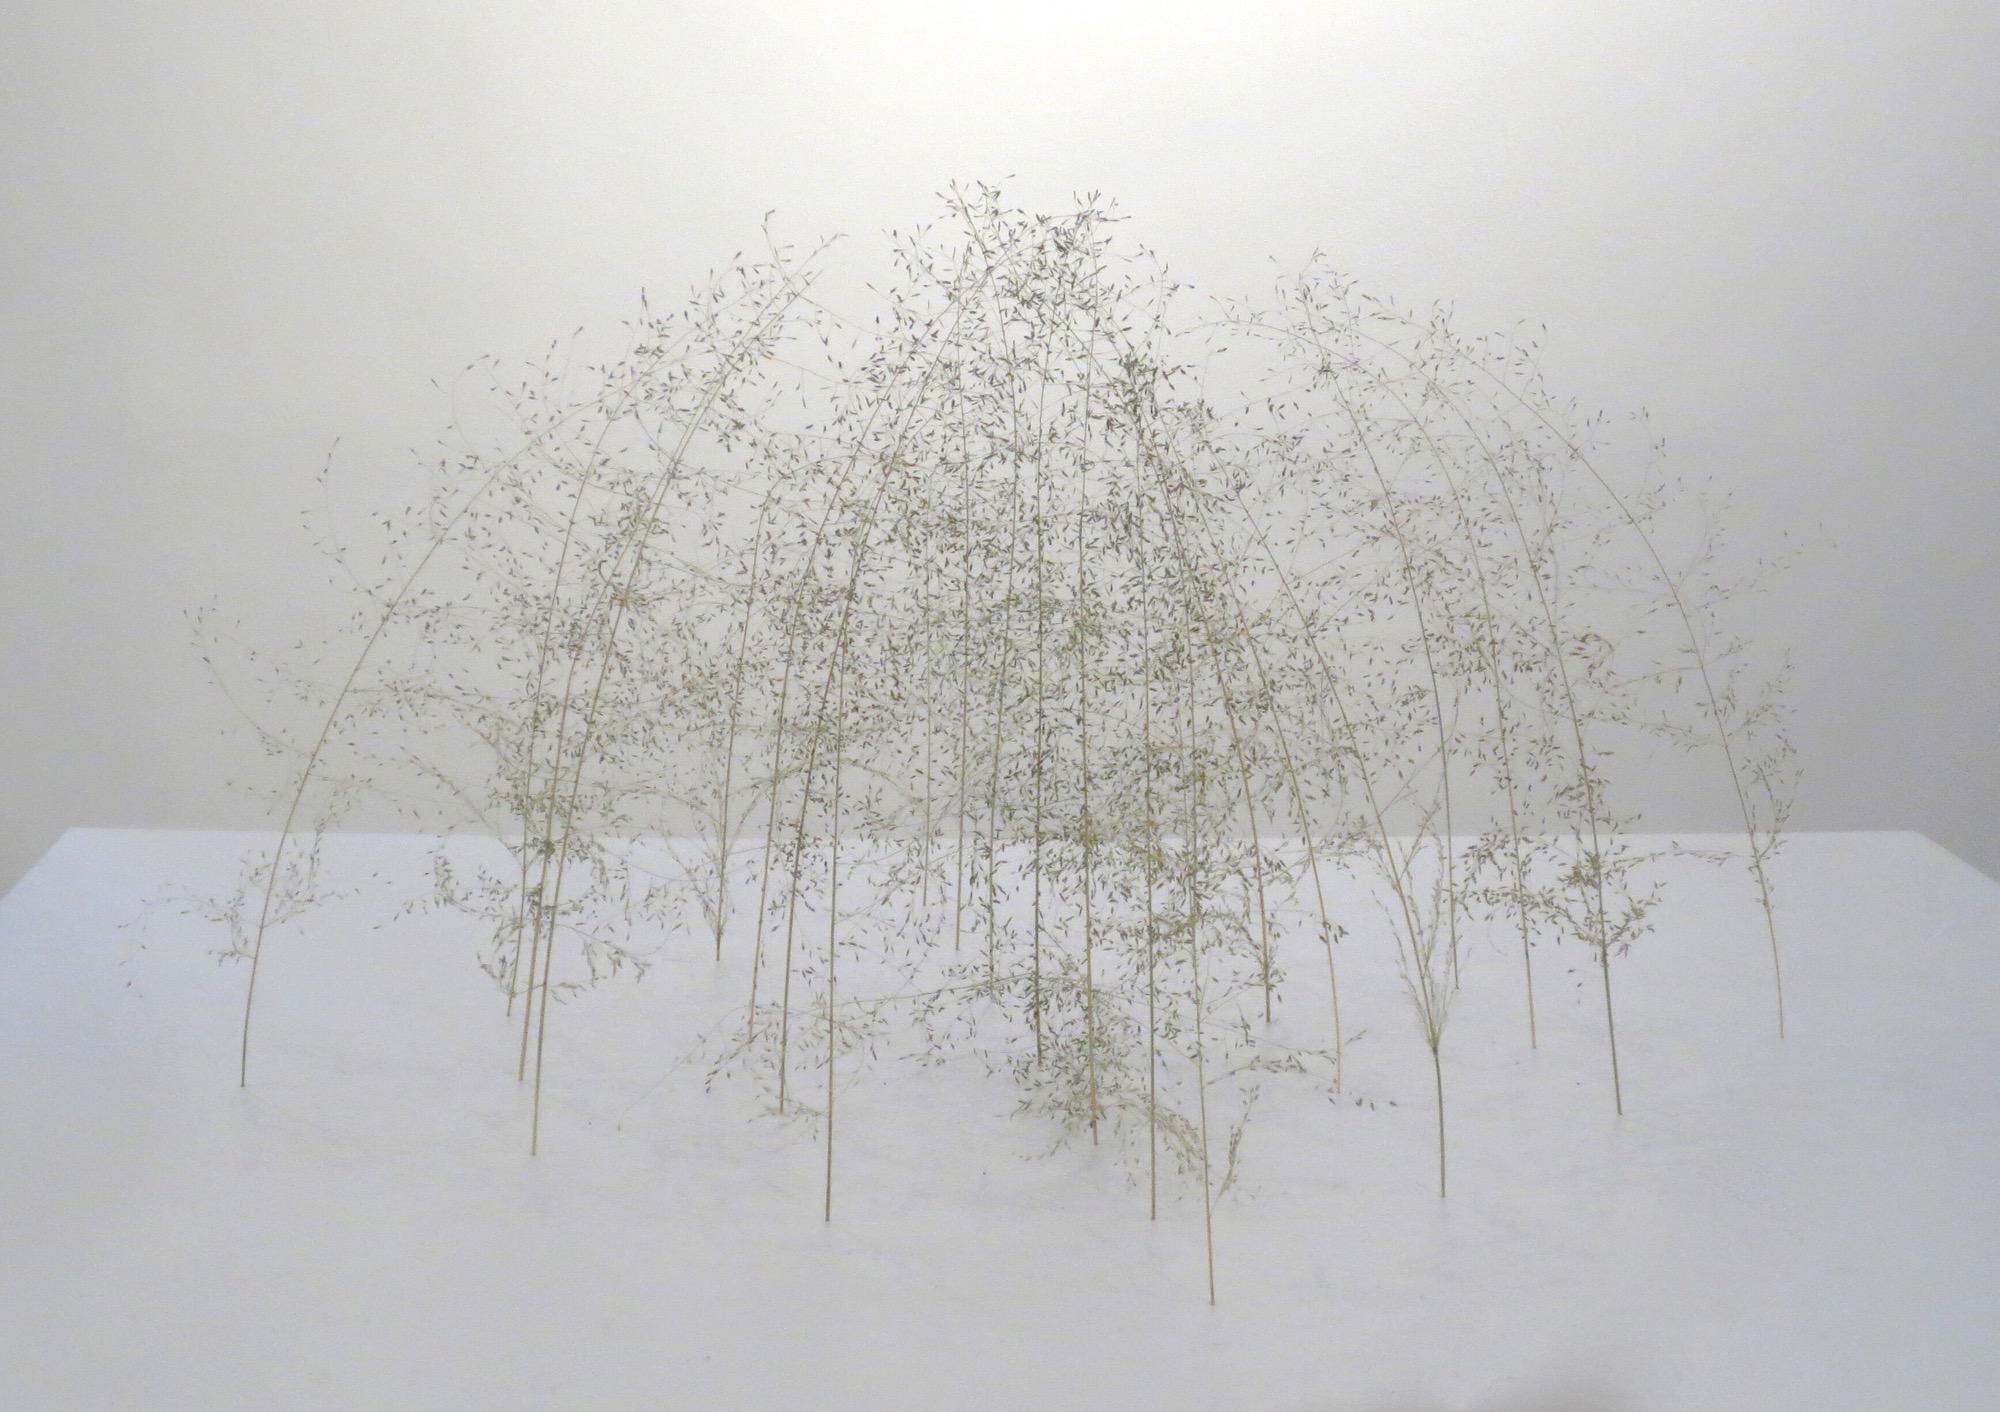 Christiane Löhr    Grass Cube [Grasquader] , 2018 Grass Stalks 11 3/4 x 21 1/2 x 21 1/2 inches  30 x 55 x 55 cm